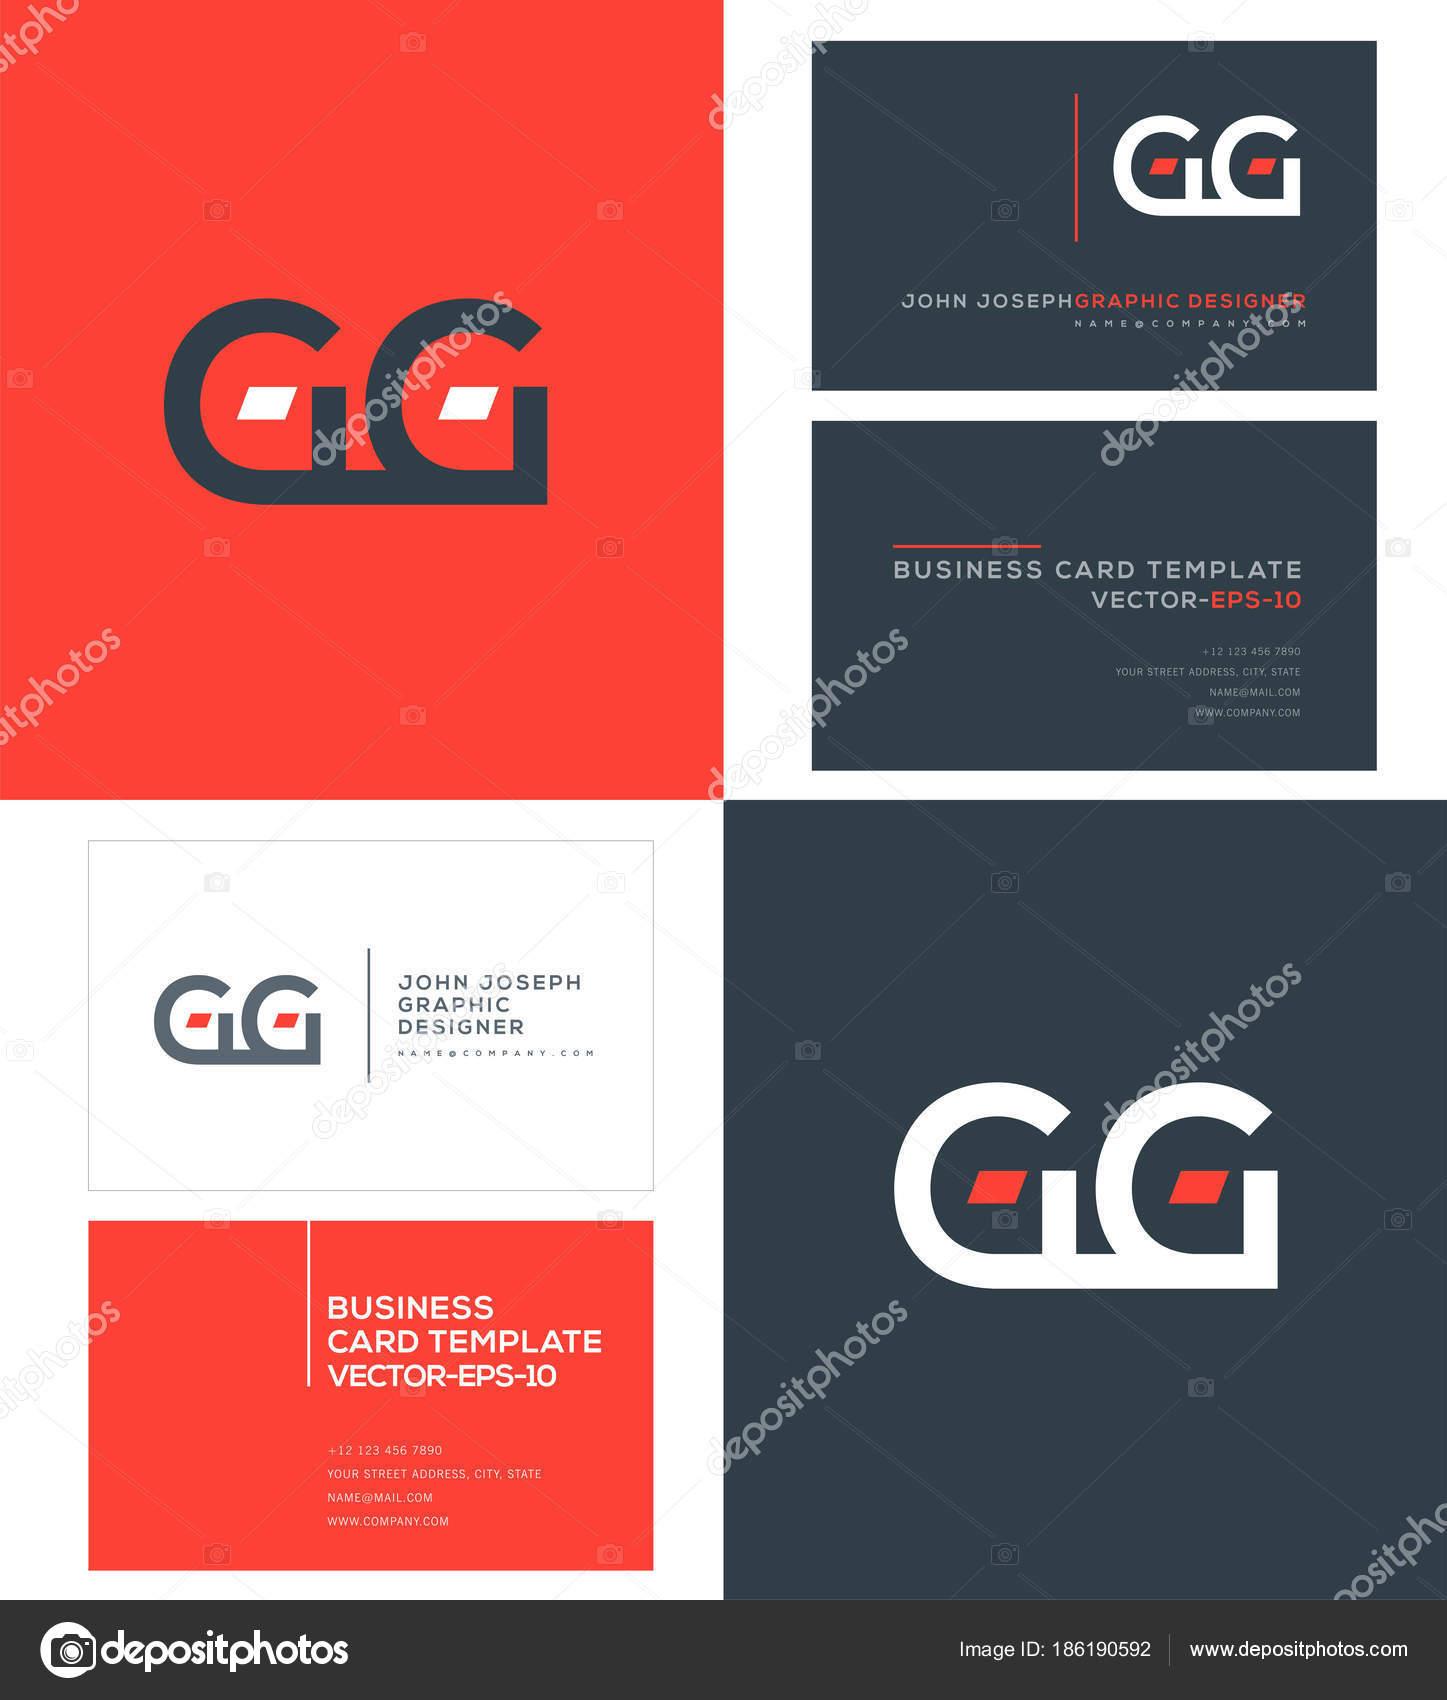 Letters logo business cards template vector stock vector letters logo business cards template vector stock vector colourmoves